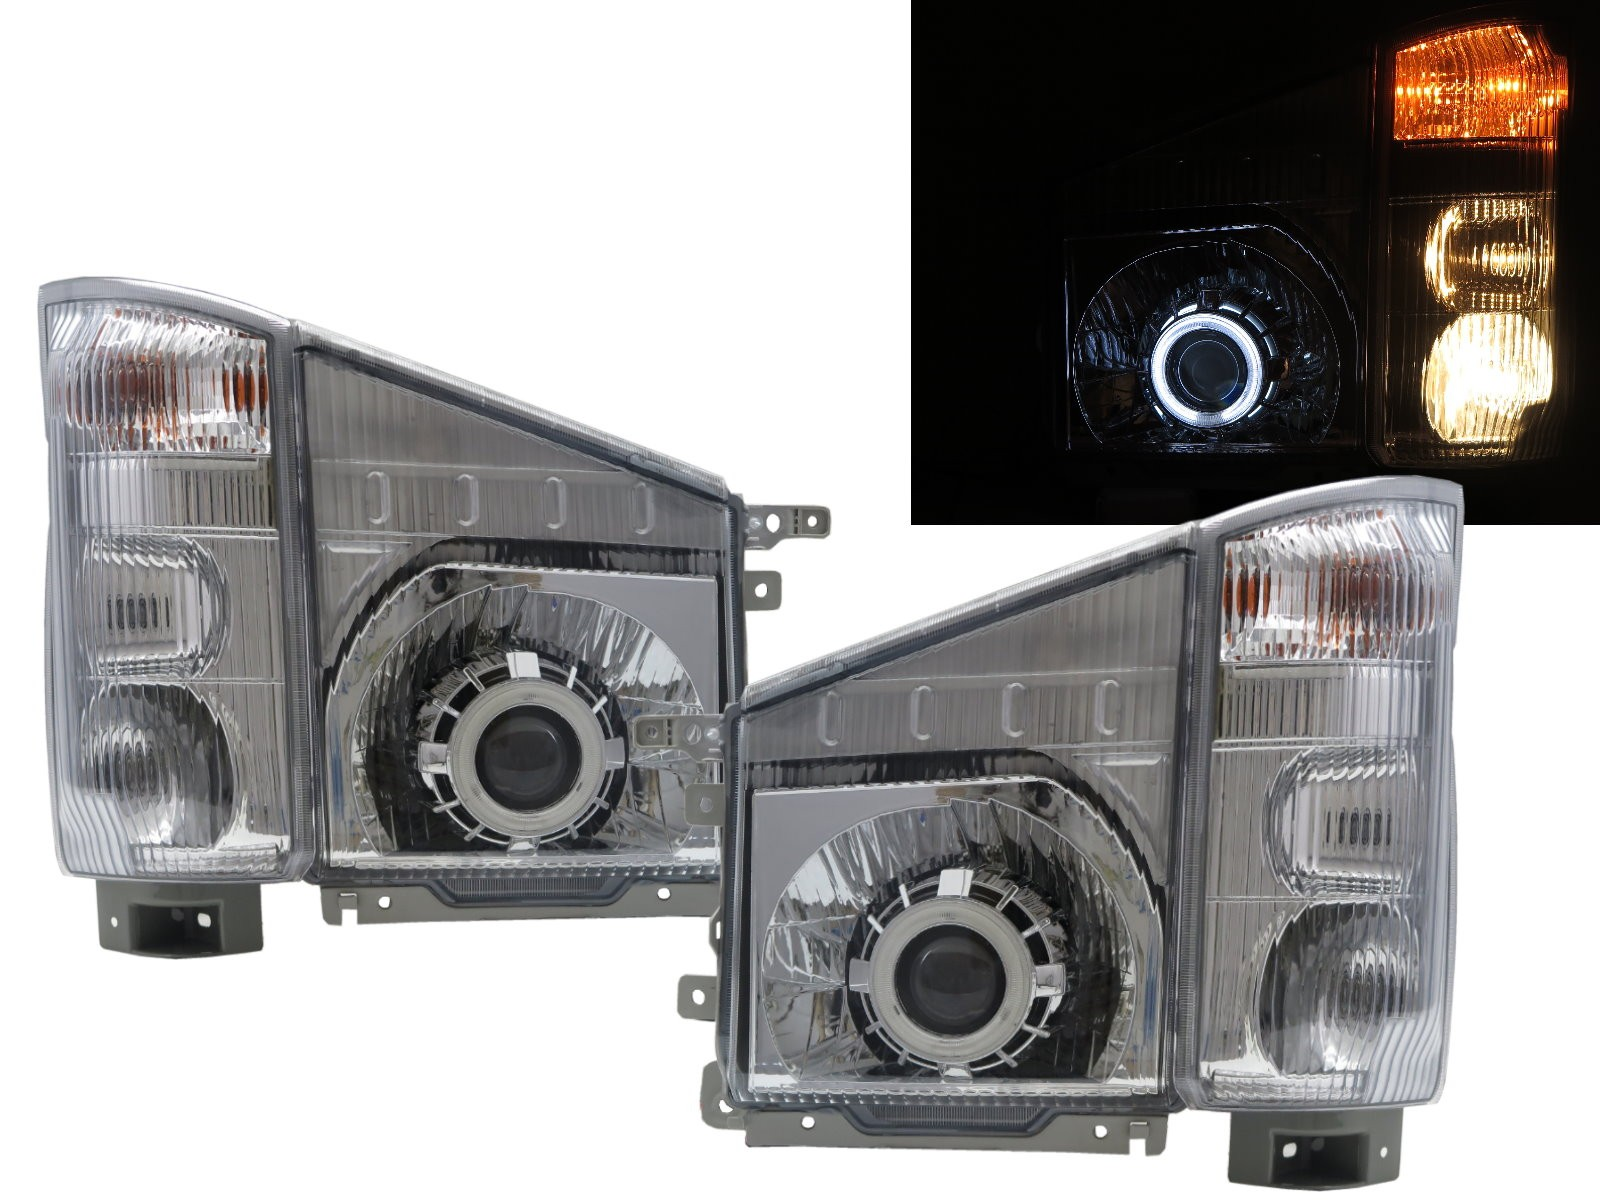 CrazyTheGod ELF 100P N-SERIES NJR85 Sixth generation 2007-present Truck CCFL Projector W/ Corner Lamp Headlight Headlamp Chrome for ISUZU RHD